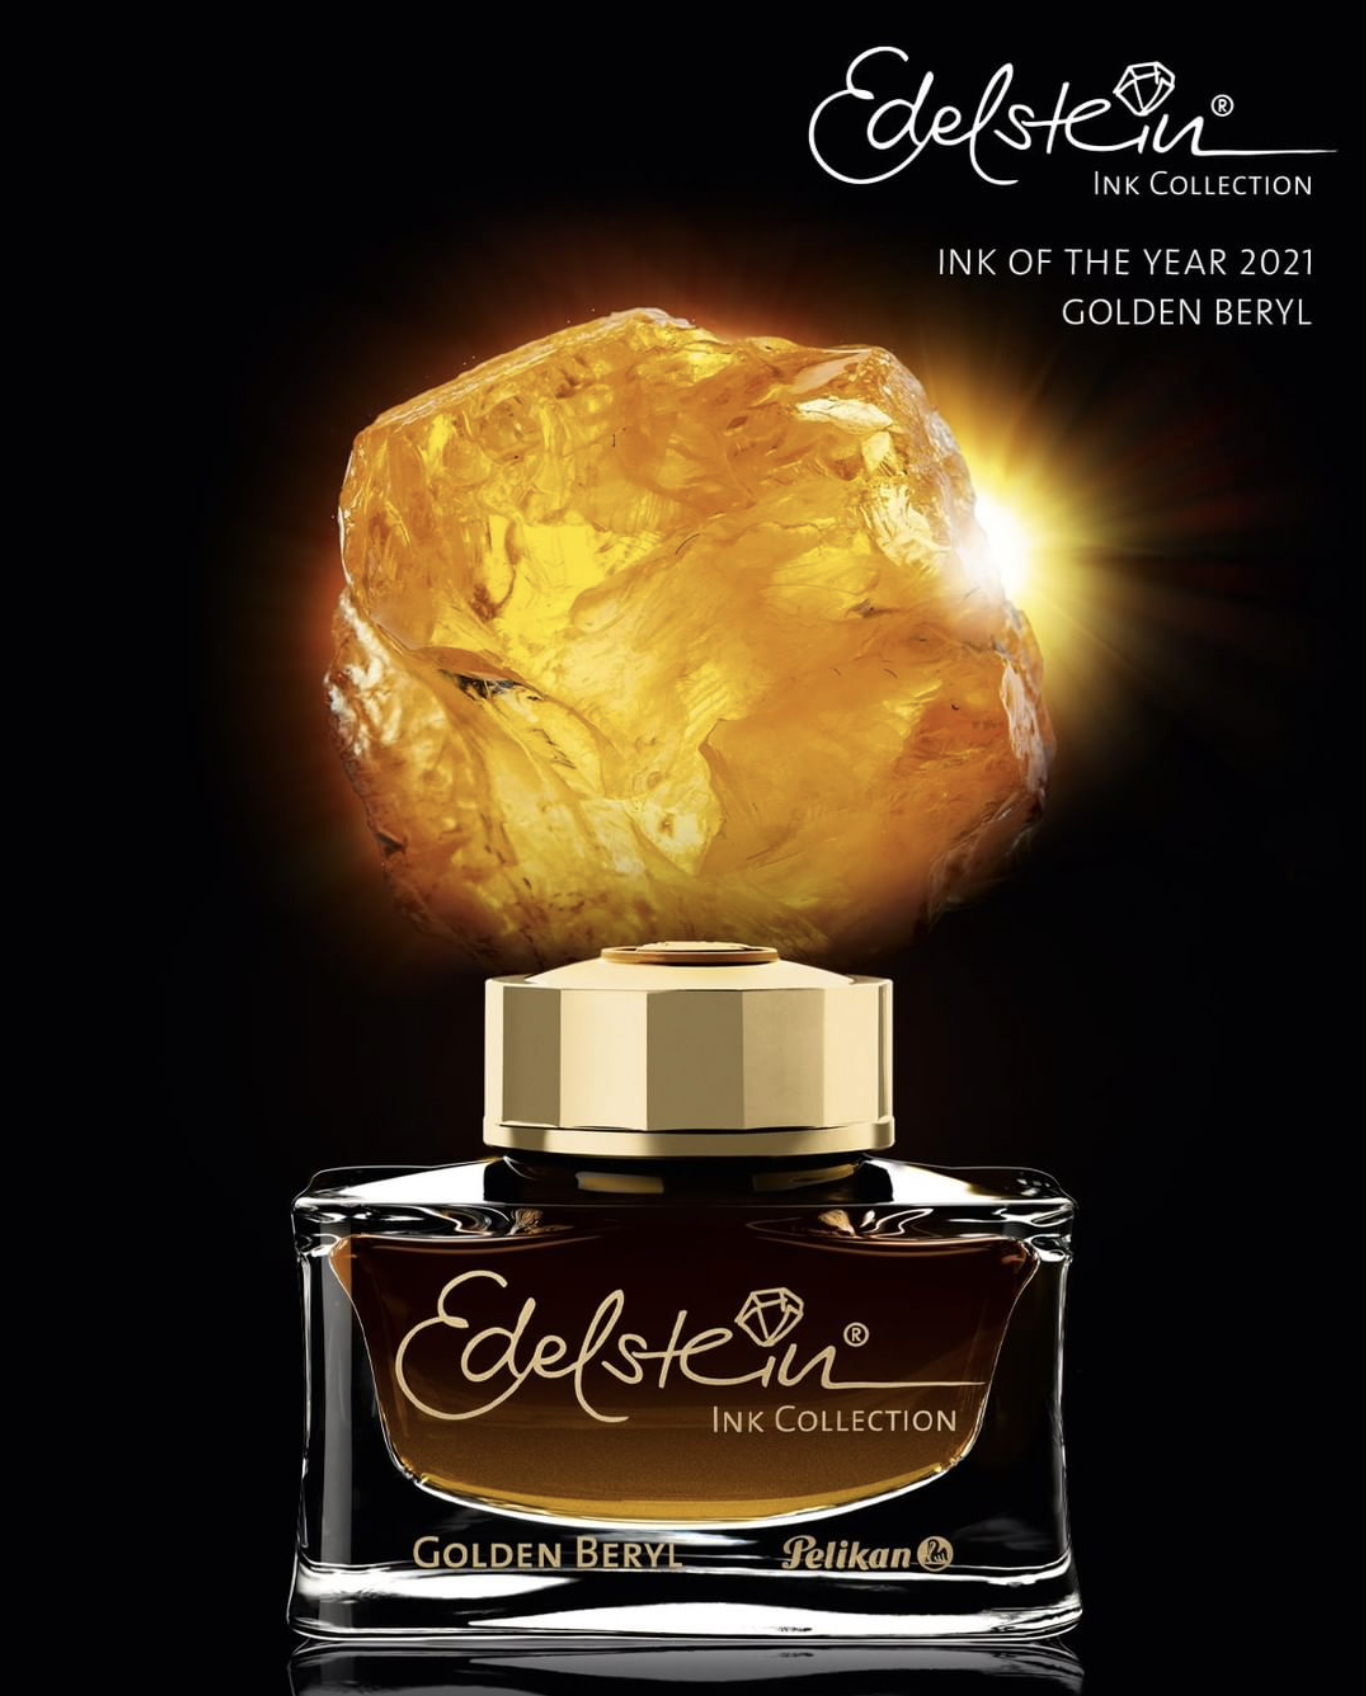 Pelikan Edelstein Ink of the Year 2021 Golden Beryl